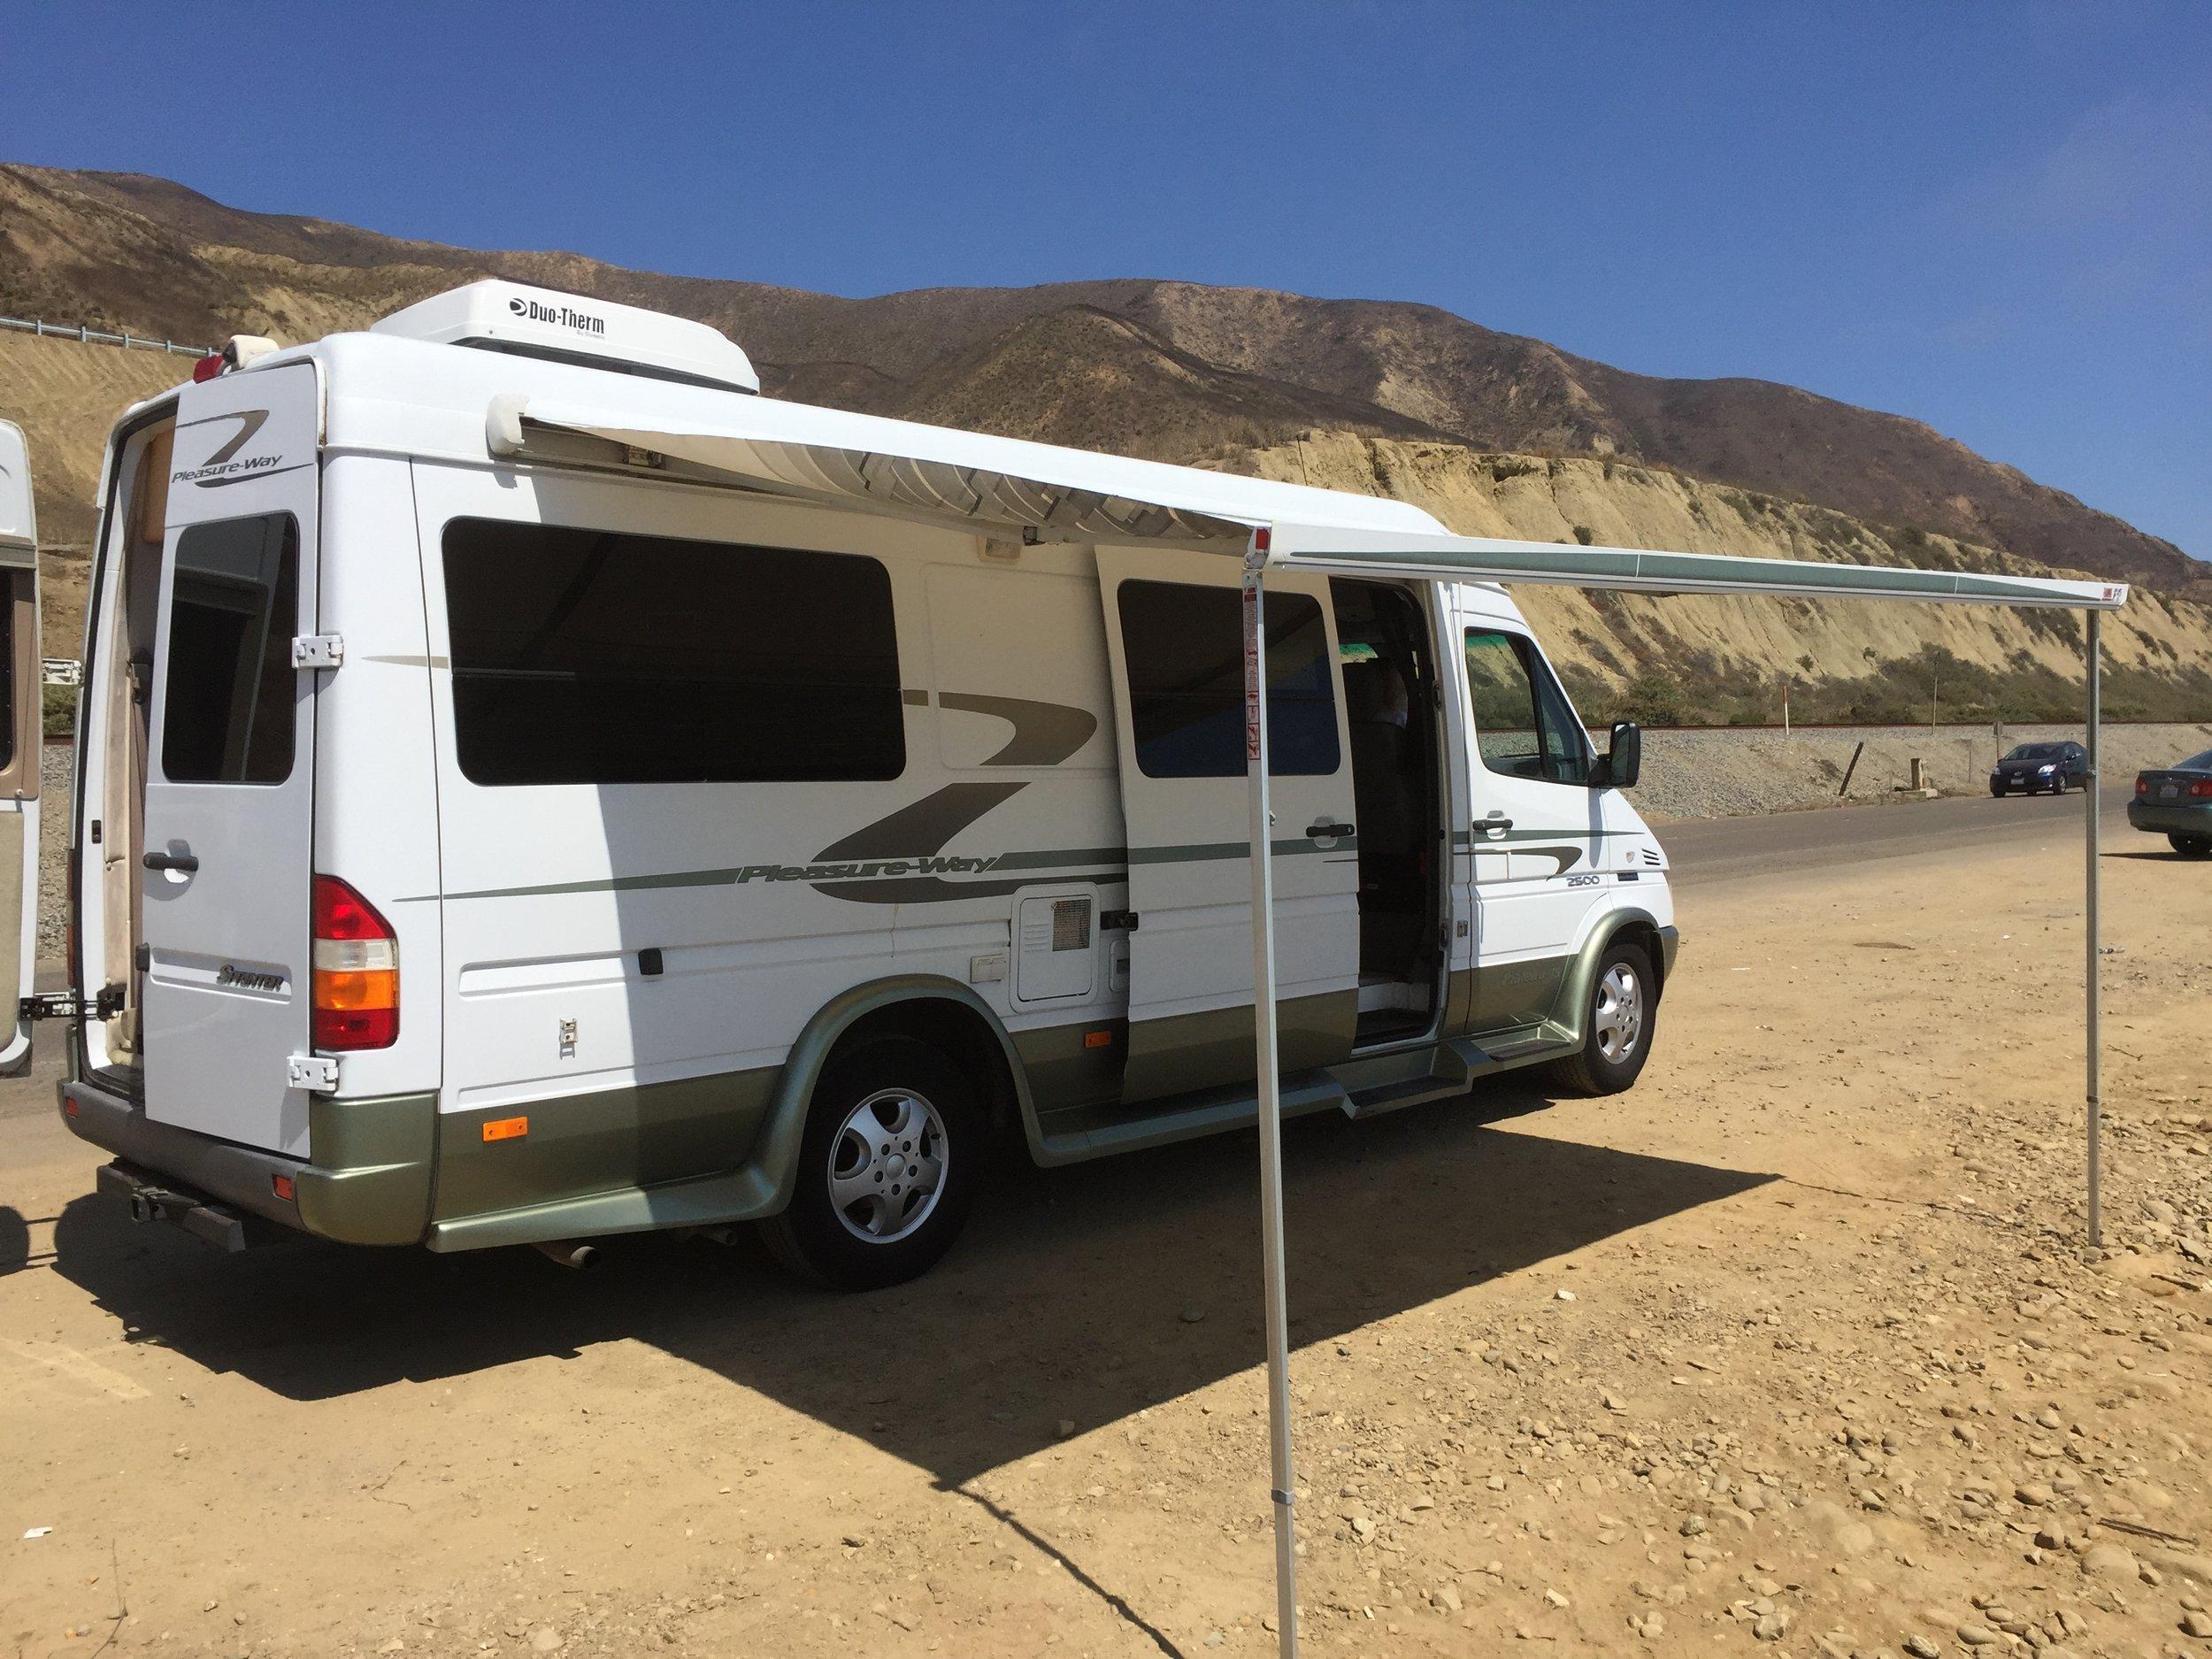 Mercedes Sprinter RV Rental Los Angeles, Mercedes RV For